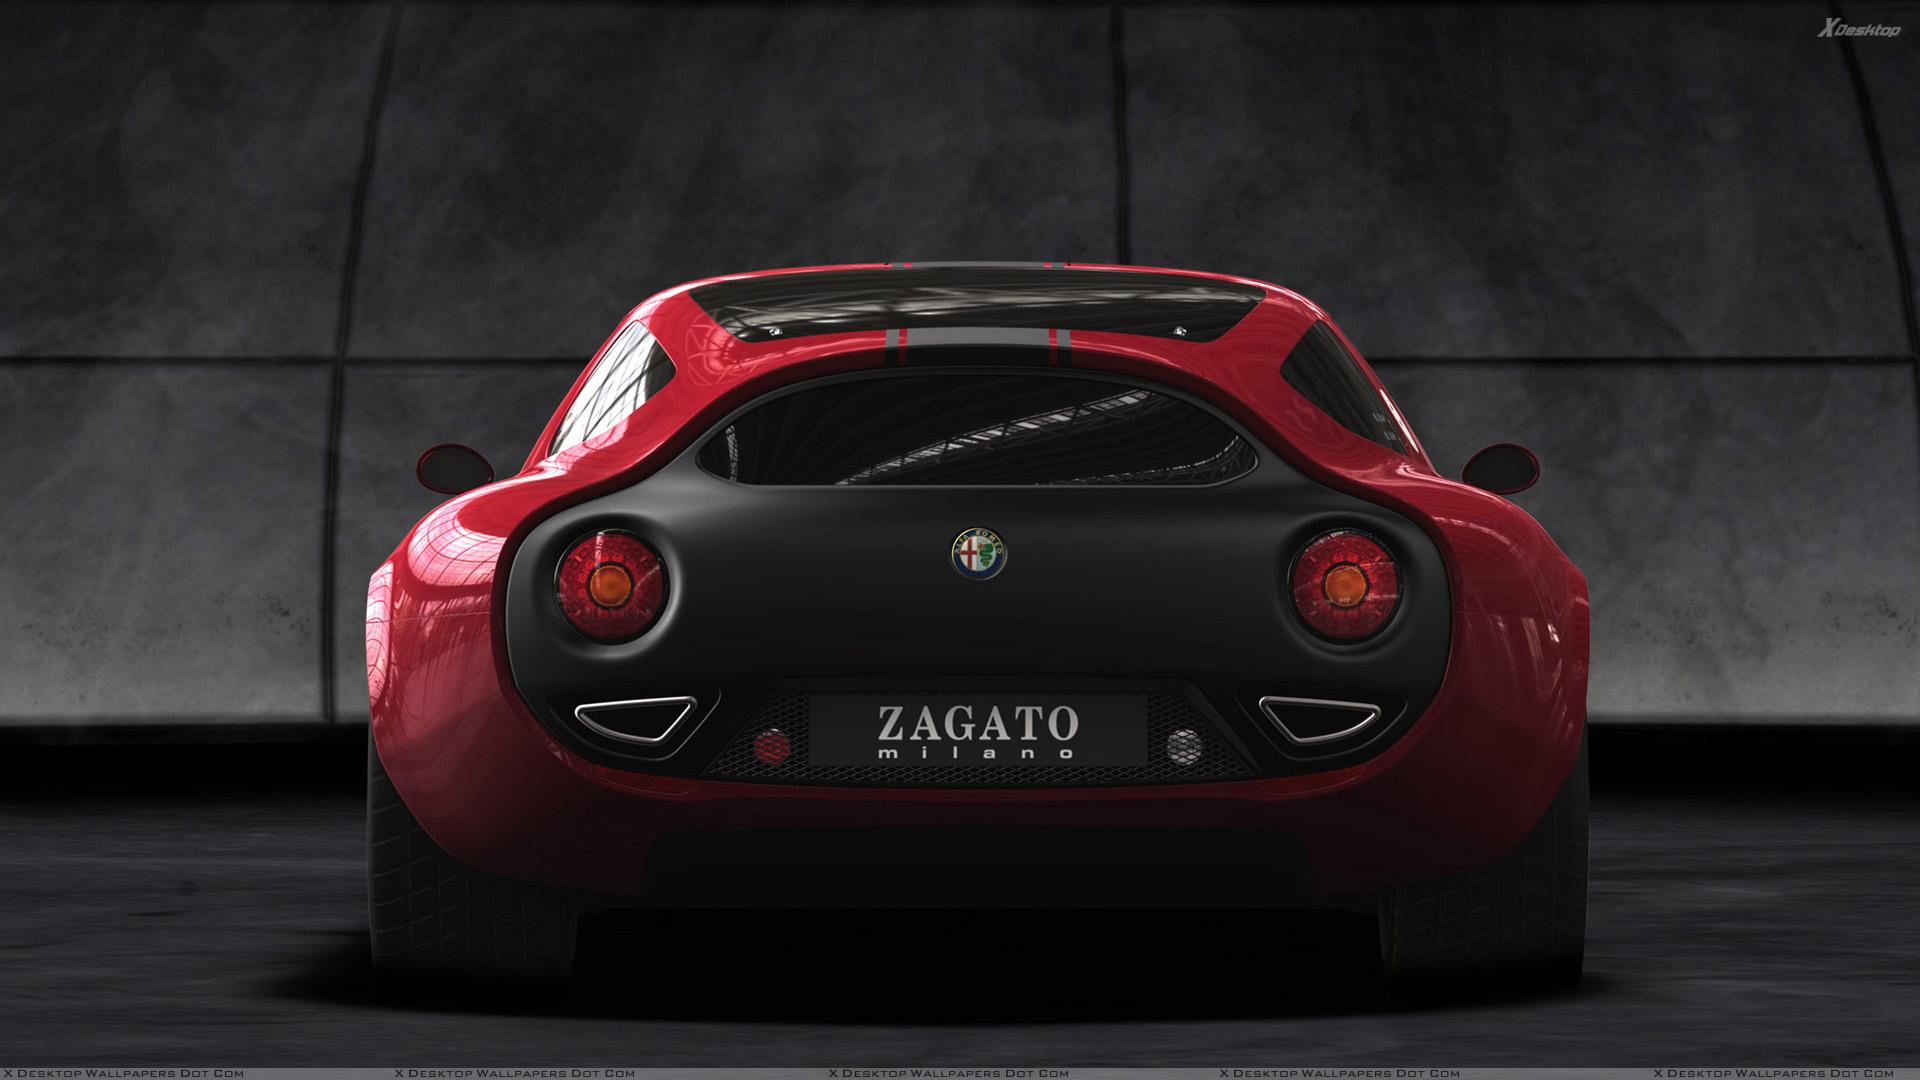 Alfa Romeo Wallpapers High Resolution 42LUKPP   4USkY 1920x1080